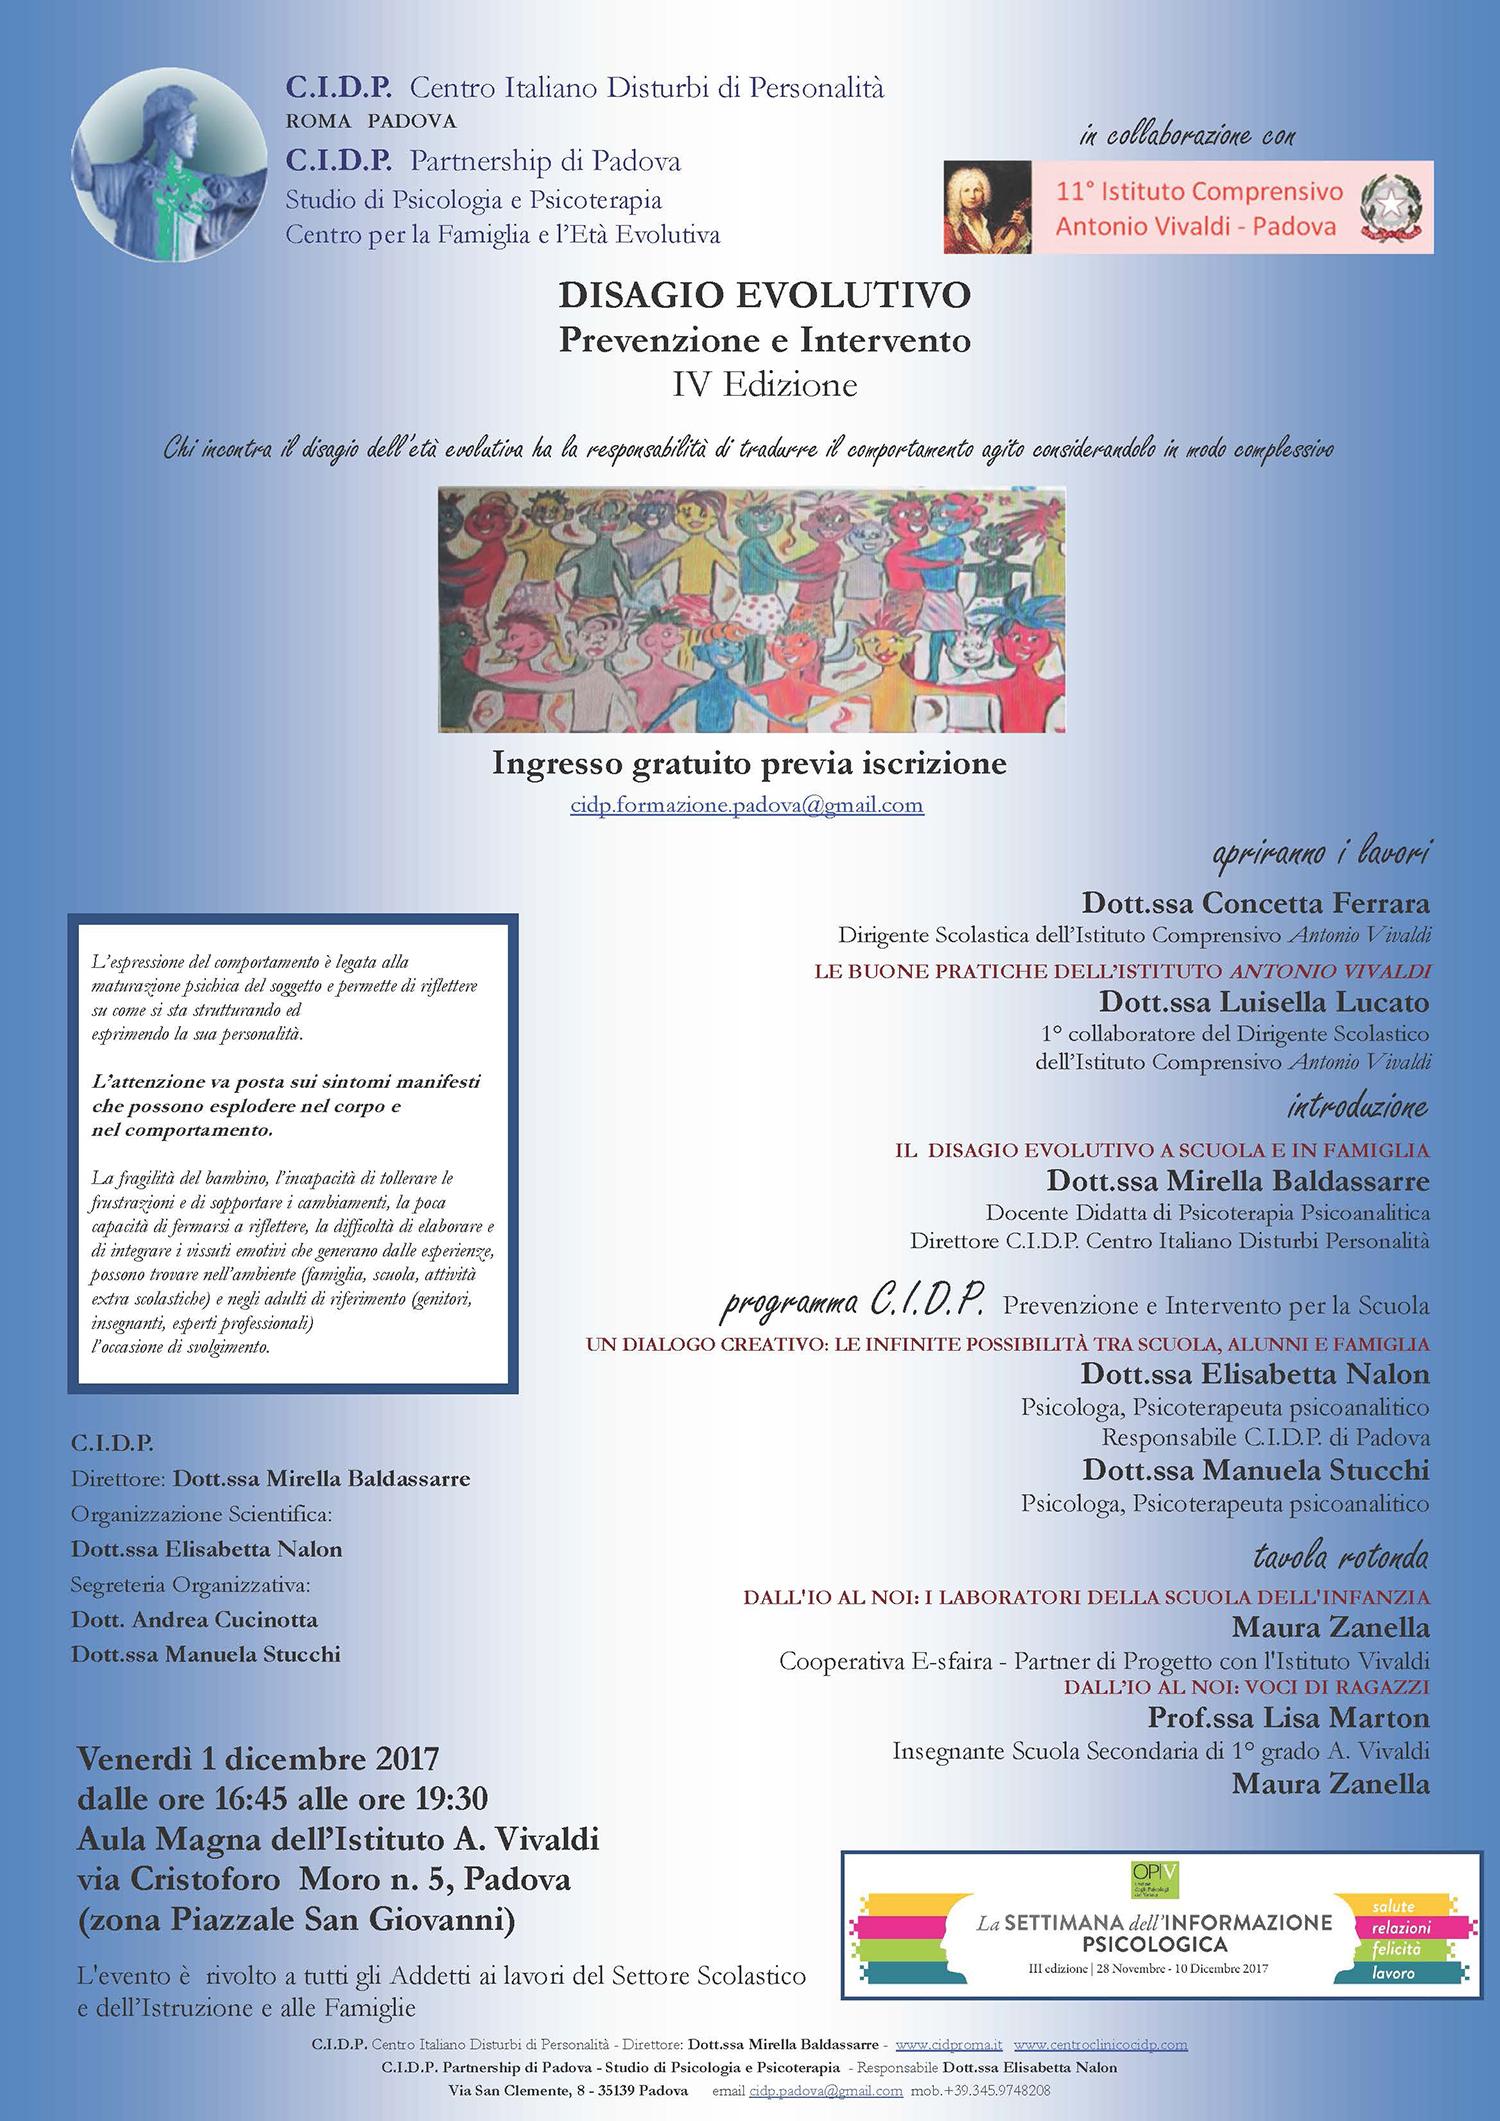 locandina IV Ediz Convegno Disagio Evolutivo - 15-11-17_l.jpg